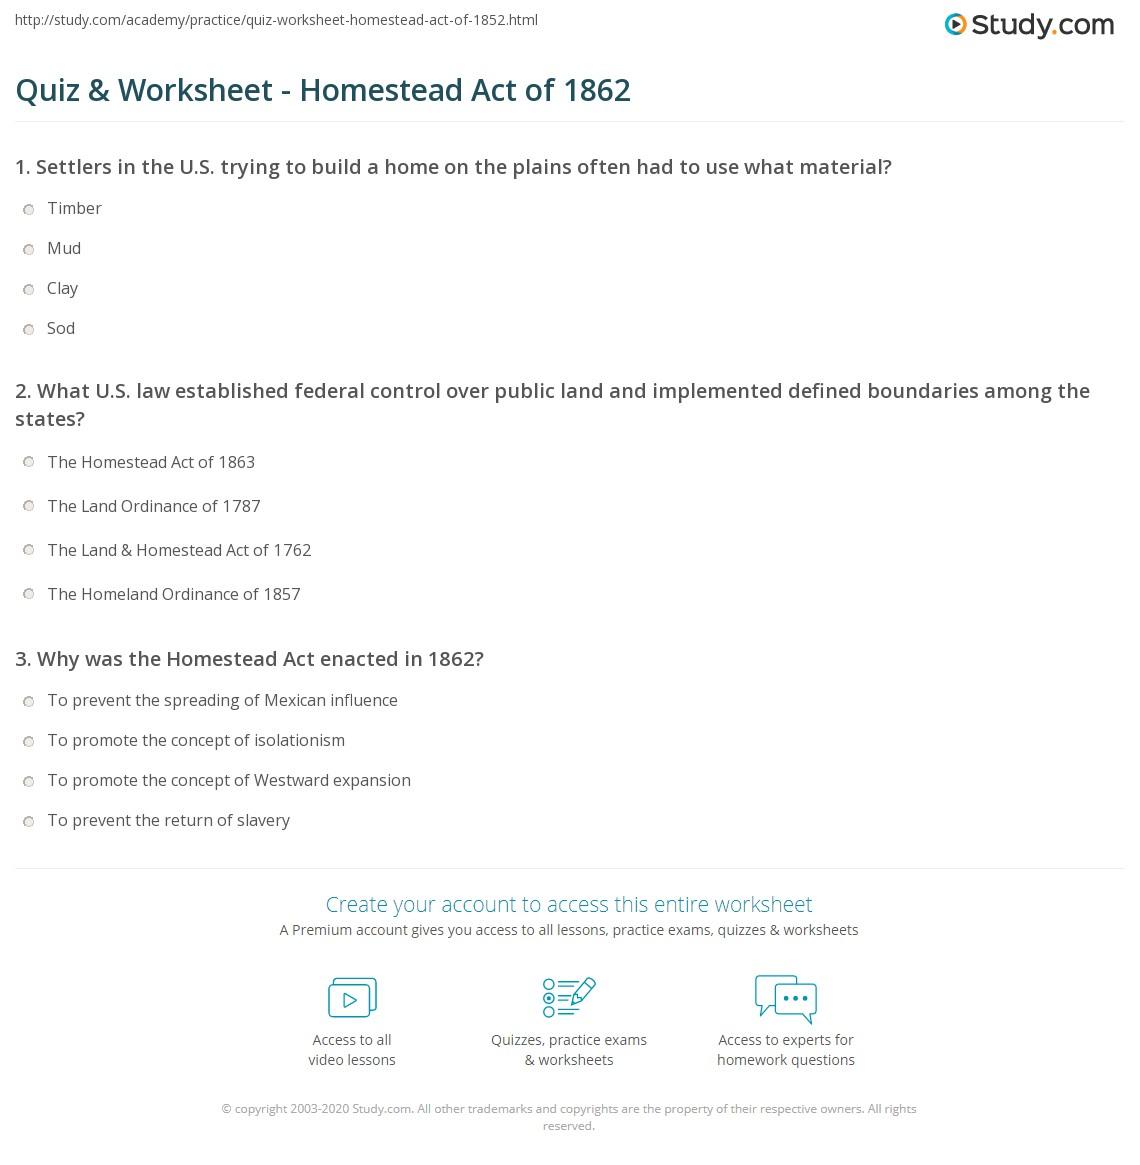 Quiz & Worksheet - Homestead Act of 1862 | Study com